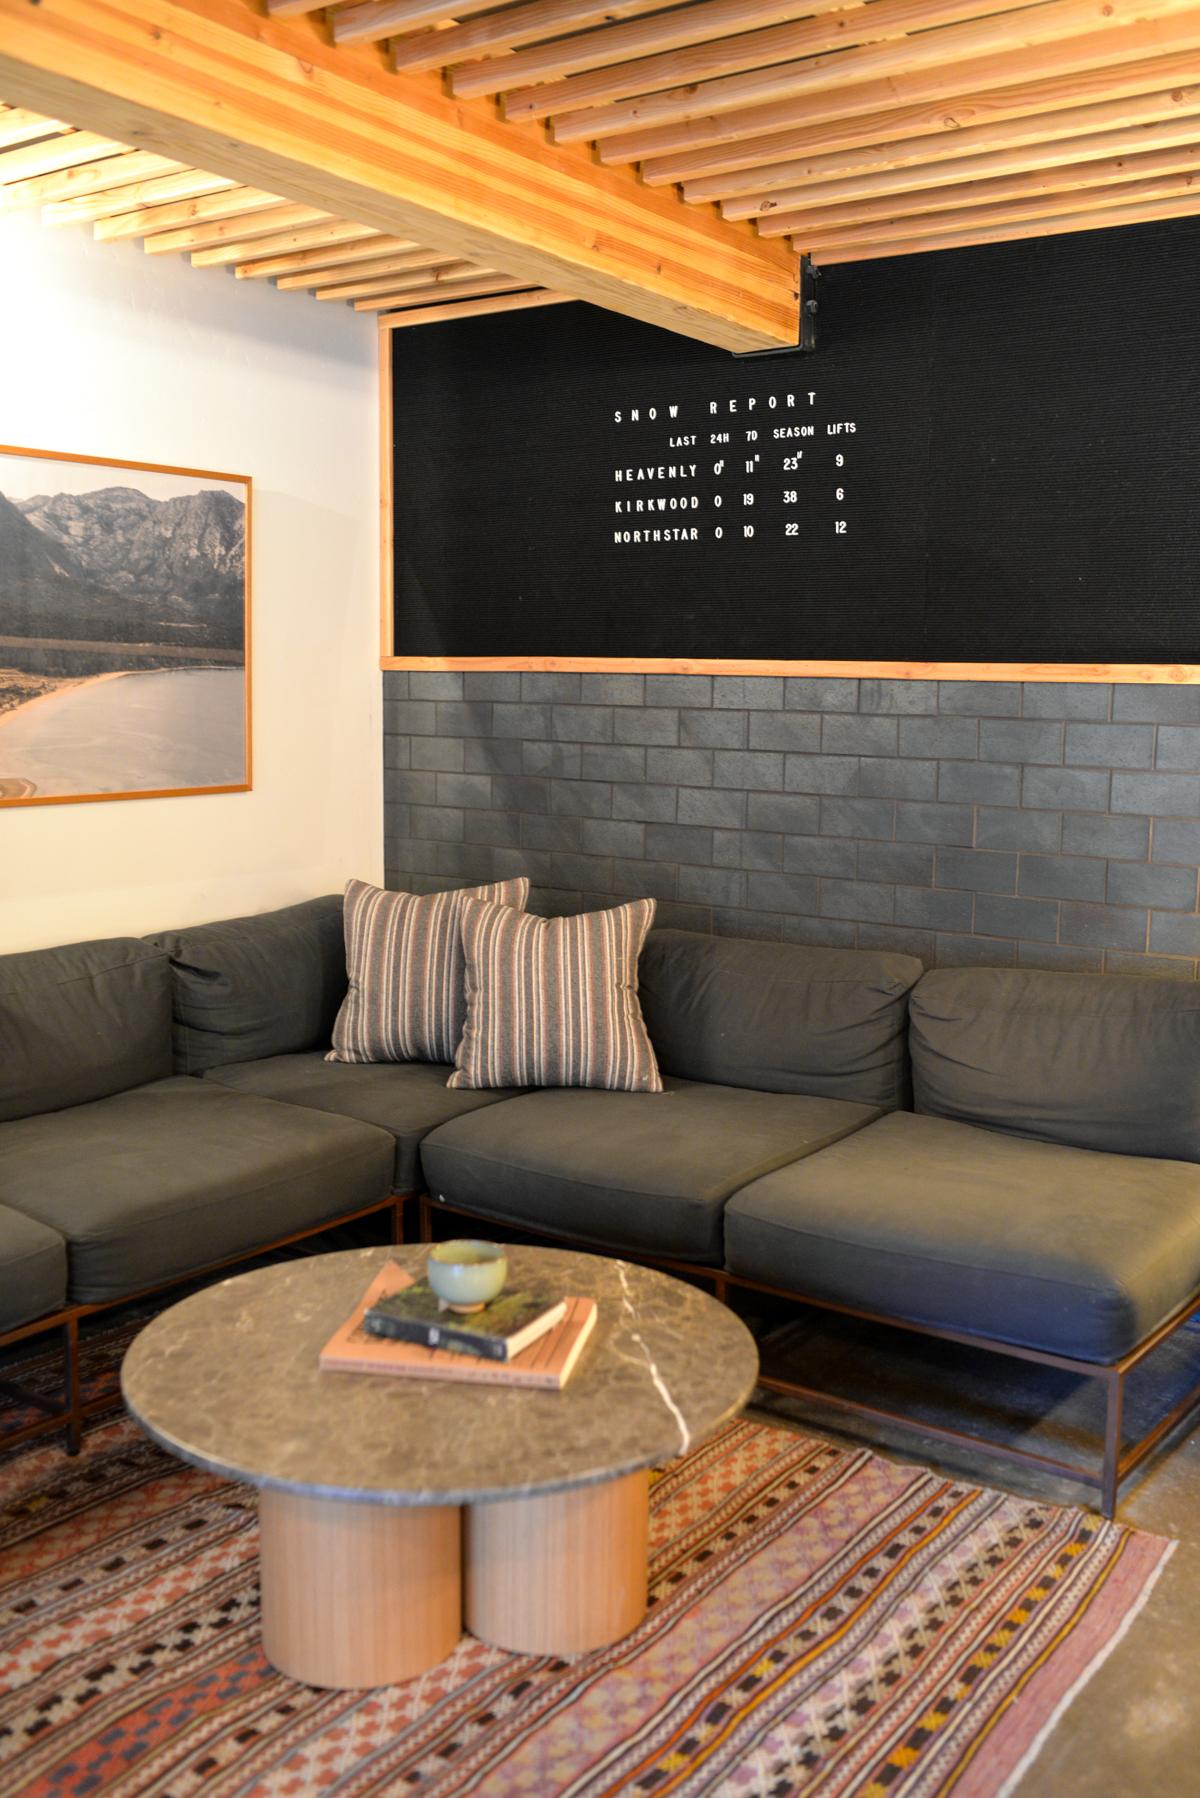 stacie-flinner-the-coachman-hotel-lake-tahoe-24